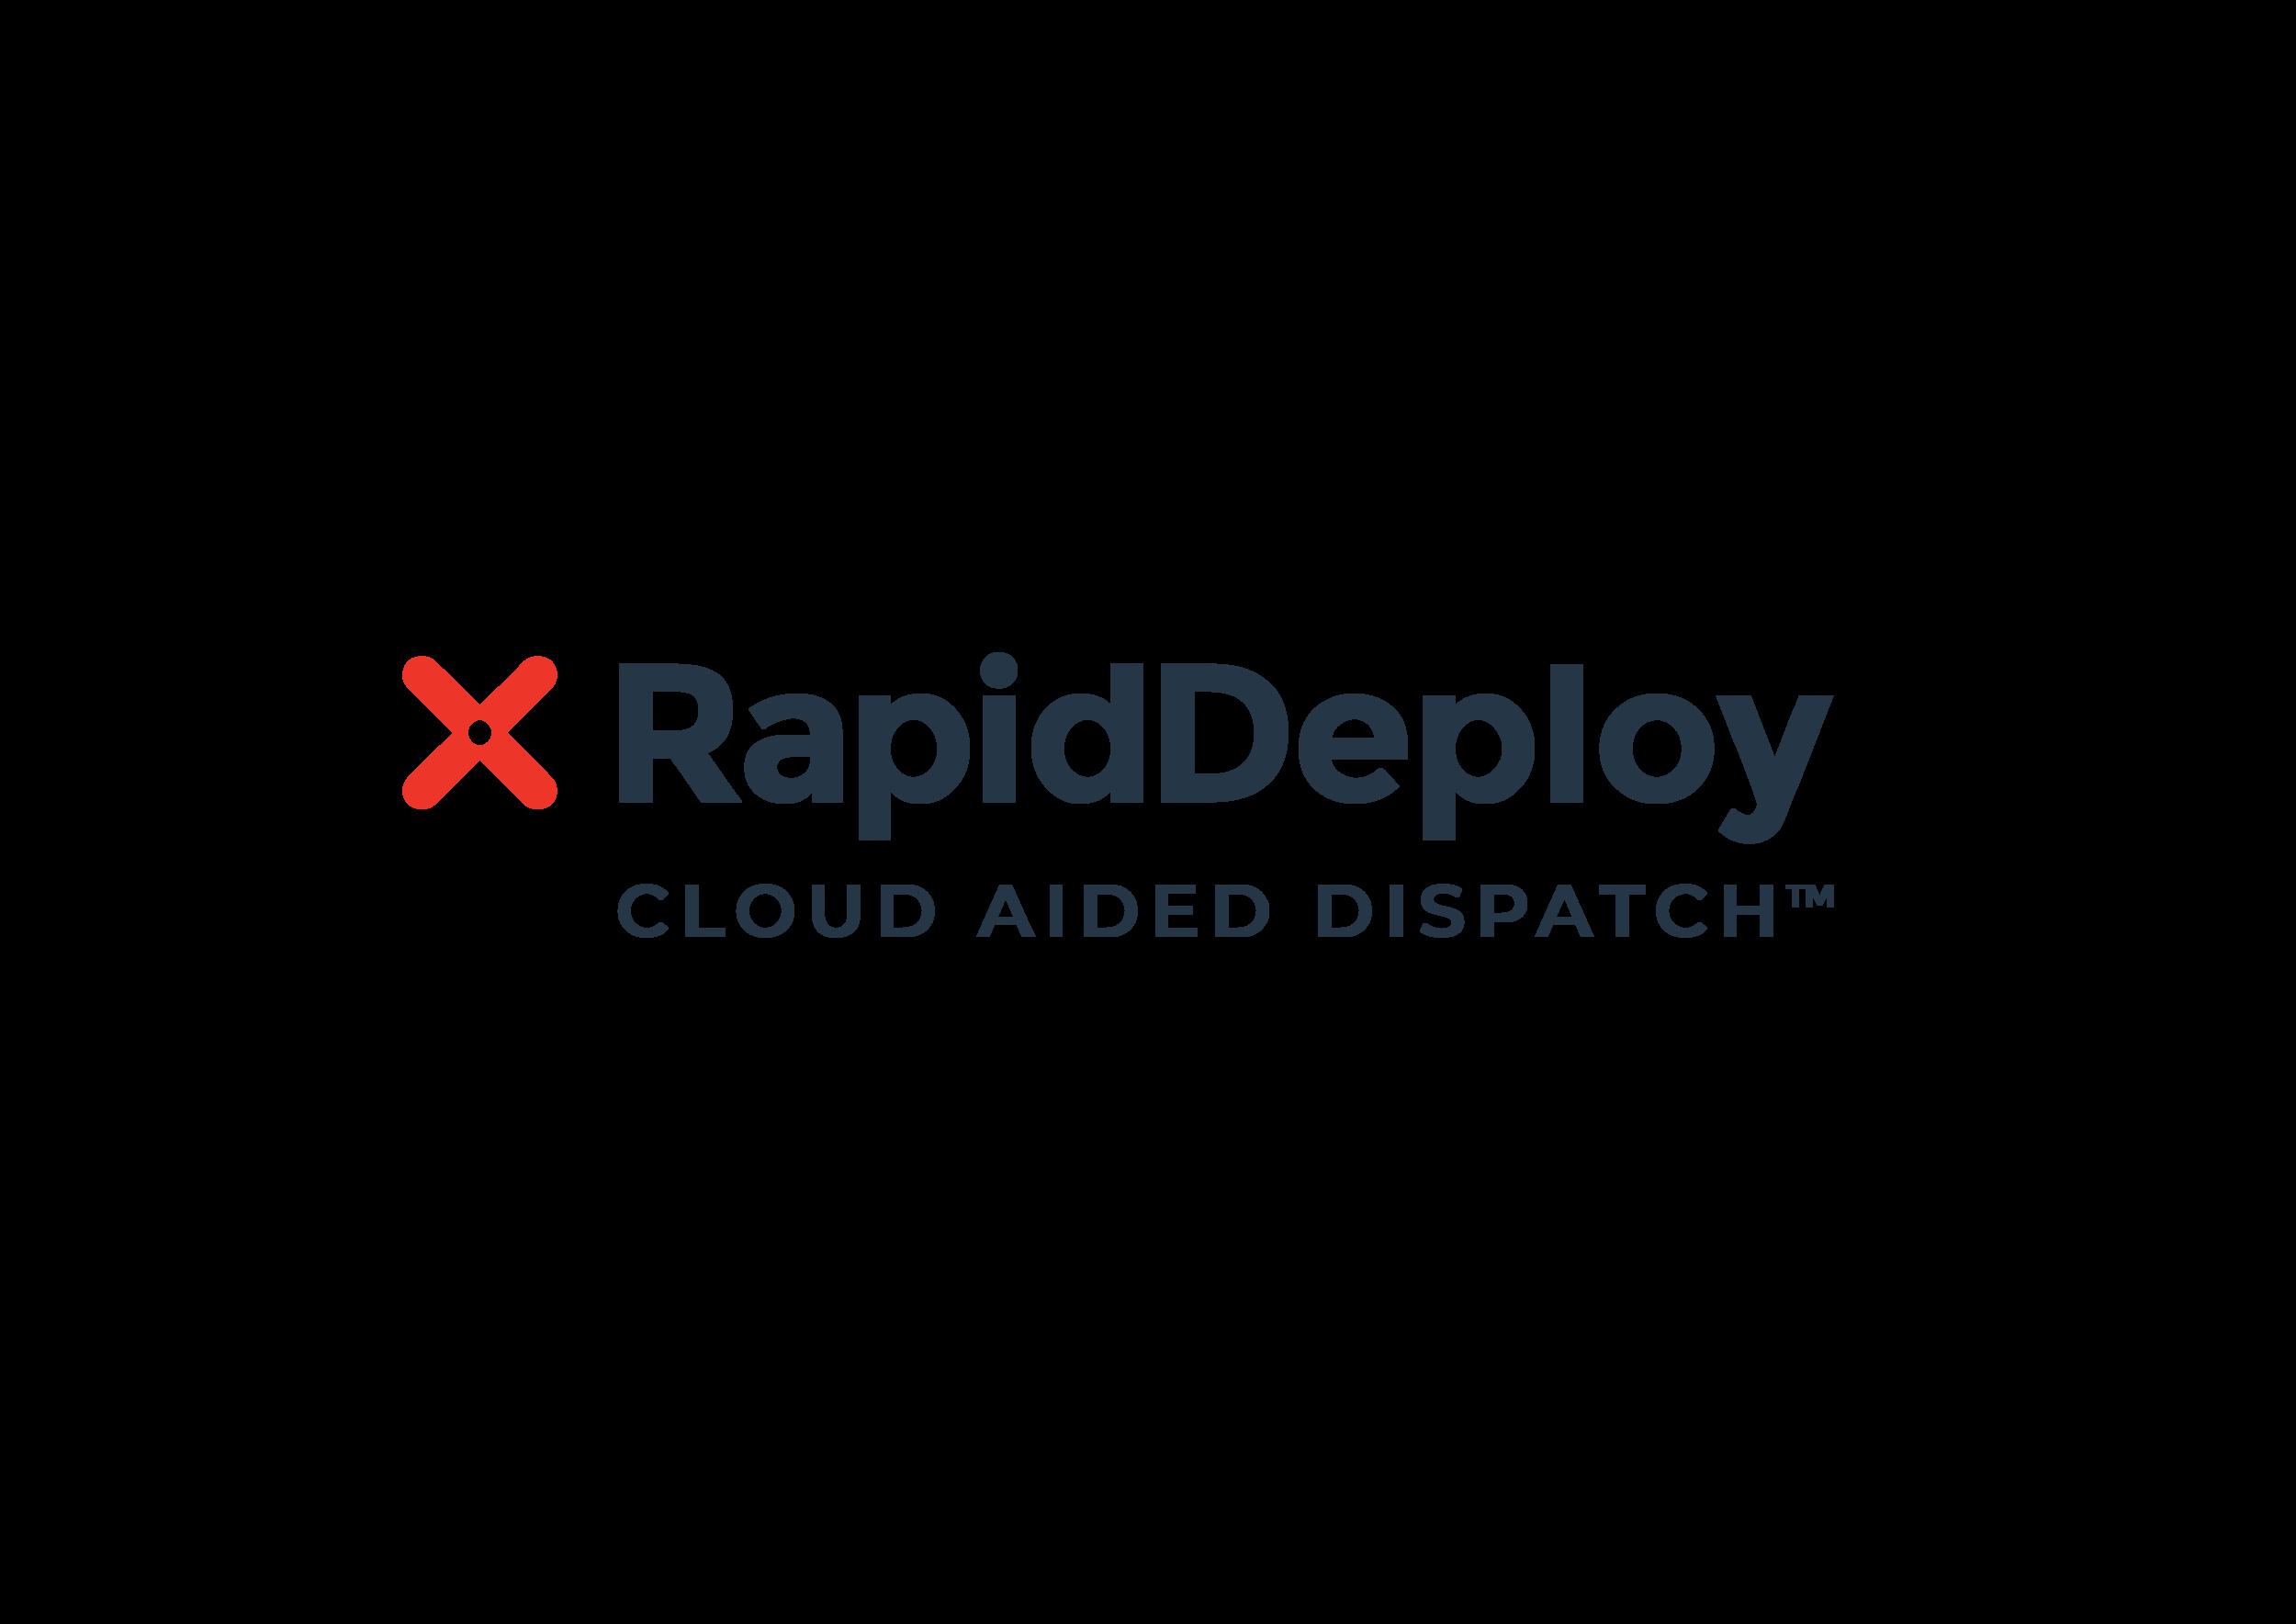 RapidDeploy logo 2019 TM-01.png